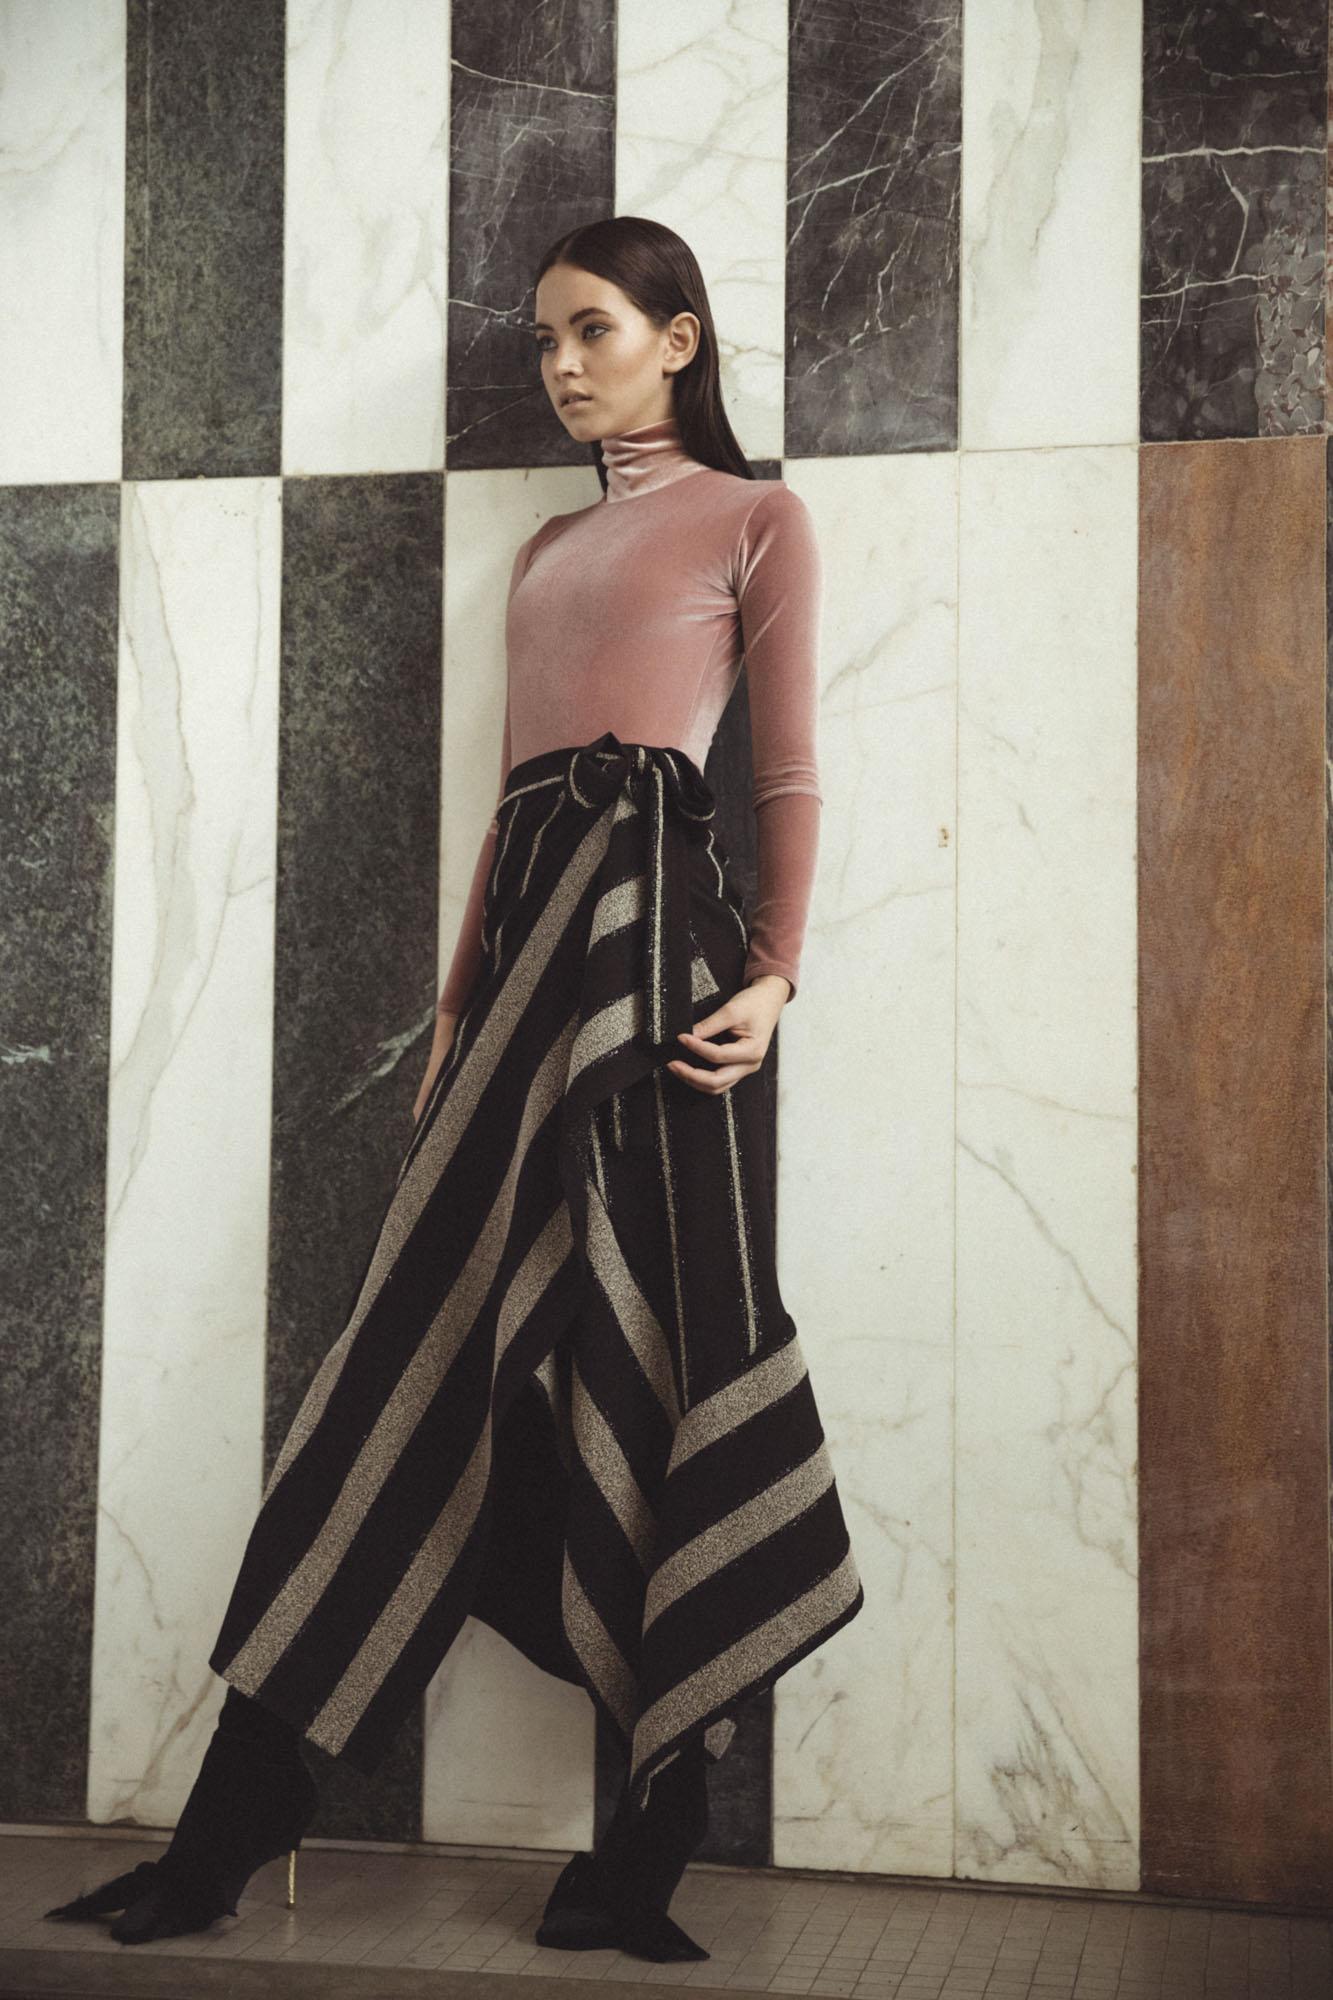 efrain_mogollon_femineus_greco_ bodysuit - _bold_ wrap skirt .JPG